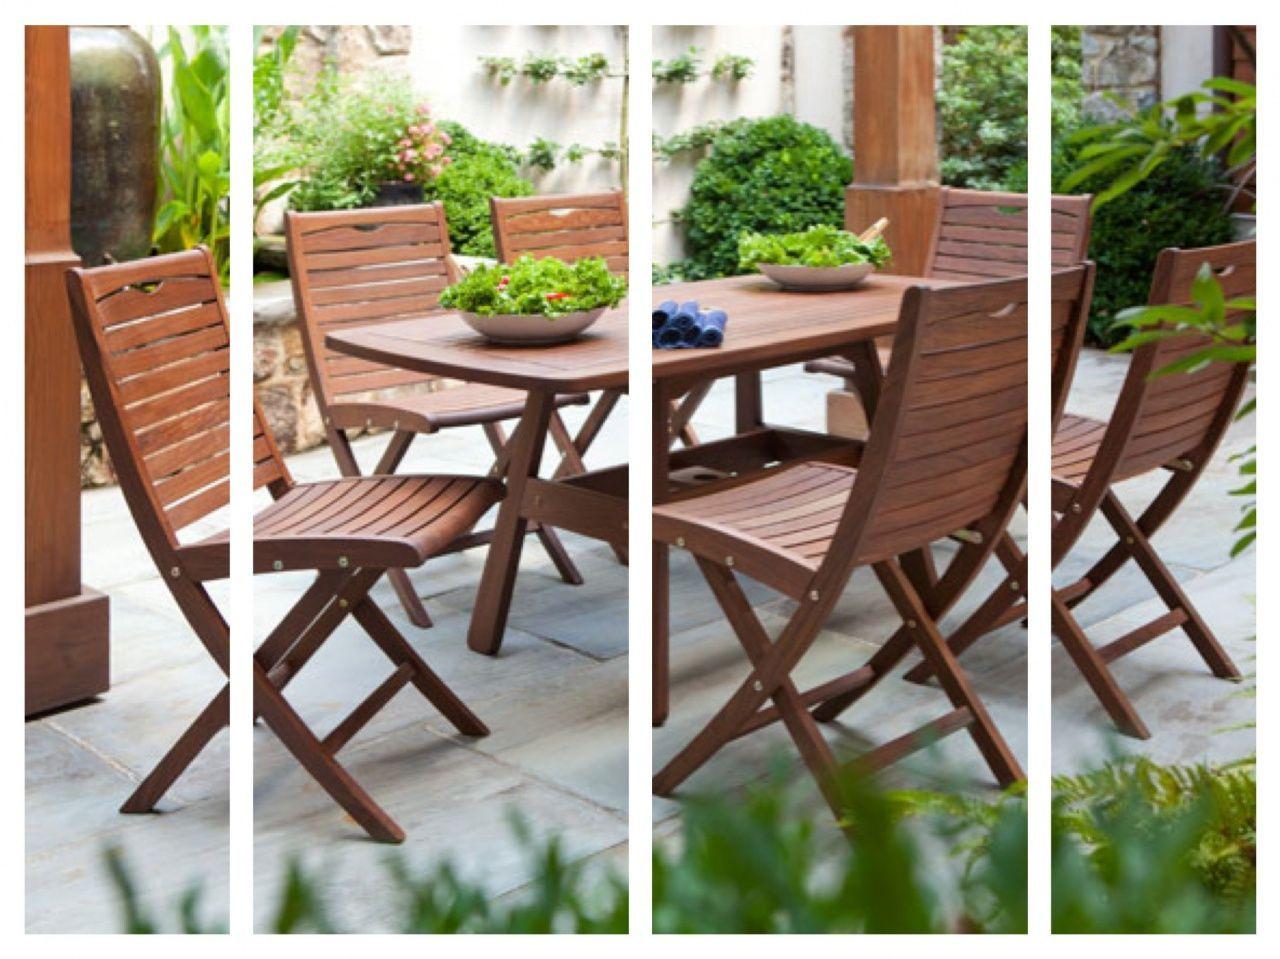 Painting Teak Outdoor Furniture Furniture Outdoor Painting Teak In 2020 Outdoor Wood Furniture Teak Outdoor Furniture Outdoor Patio Chairs